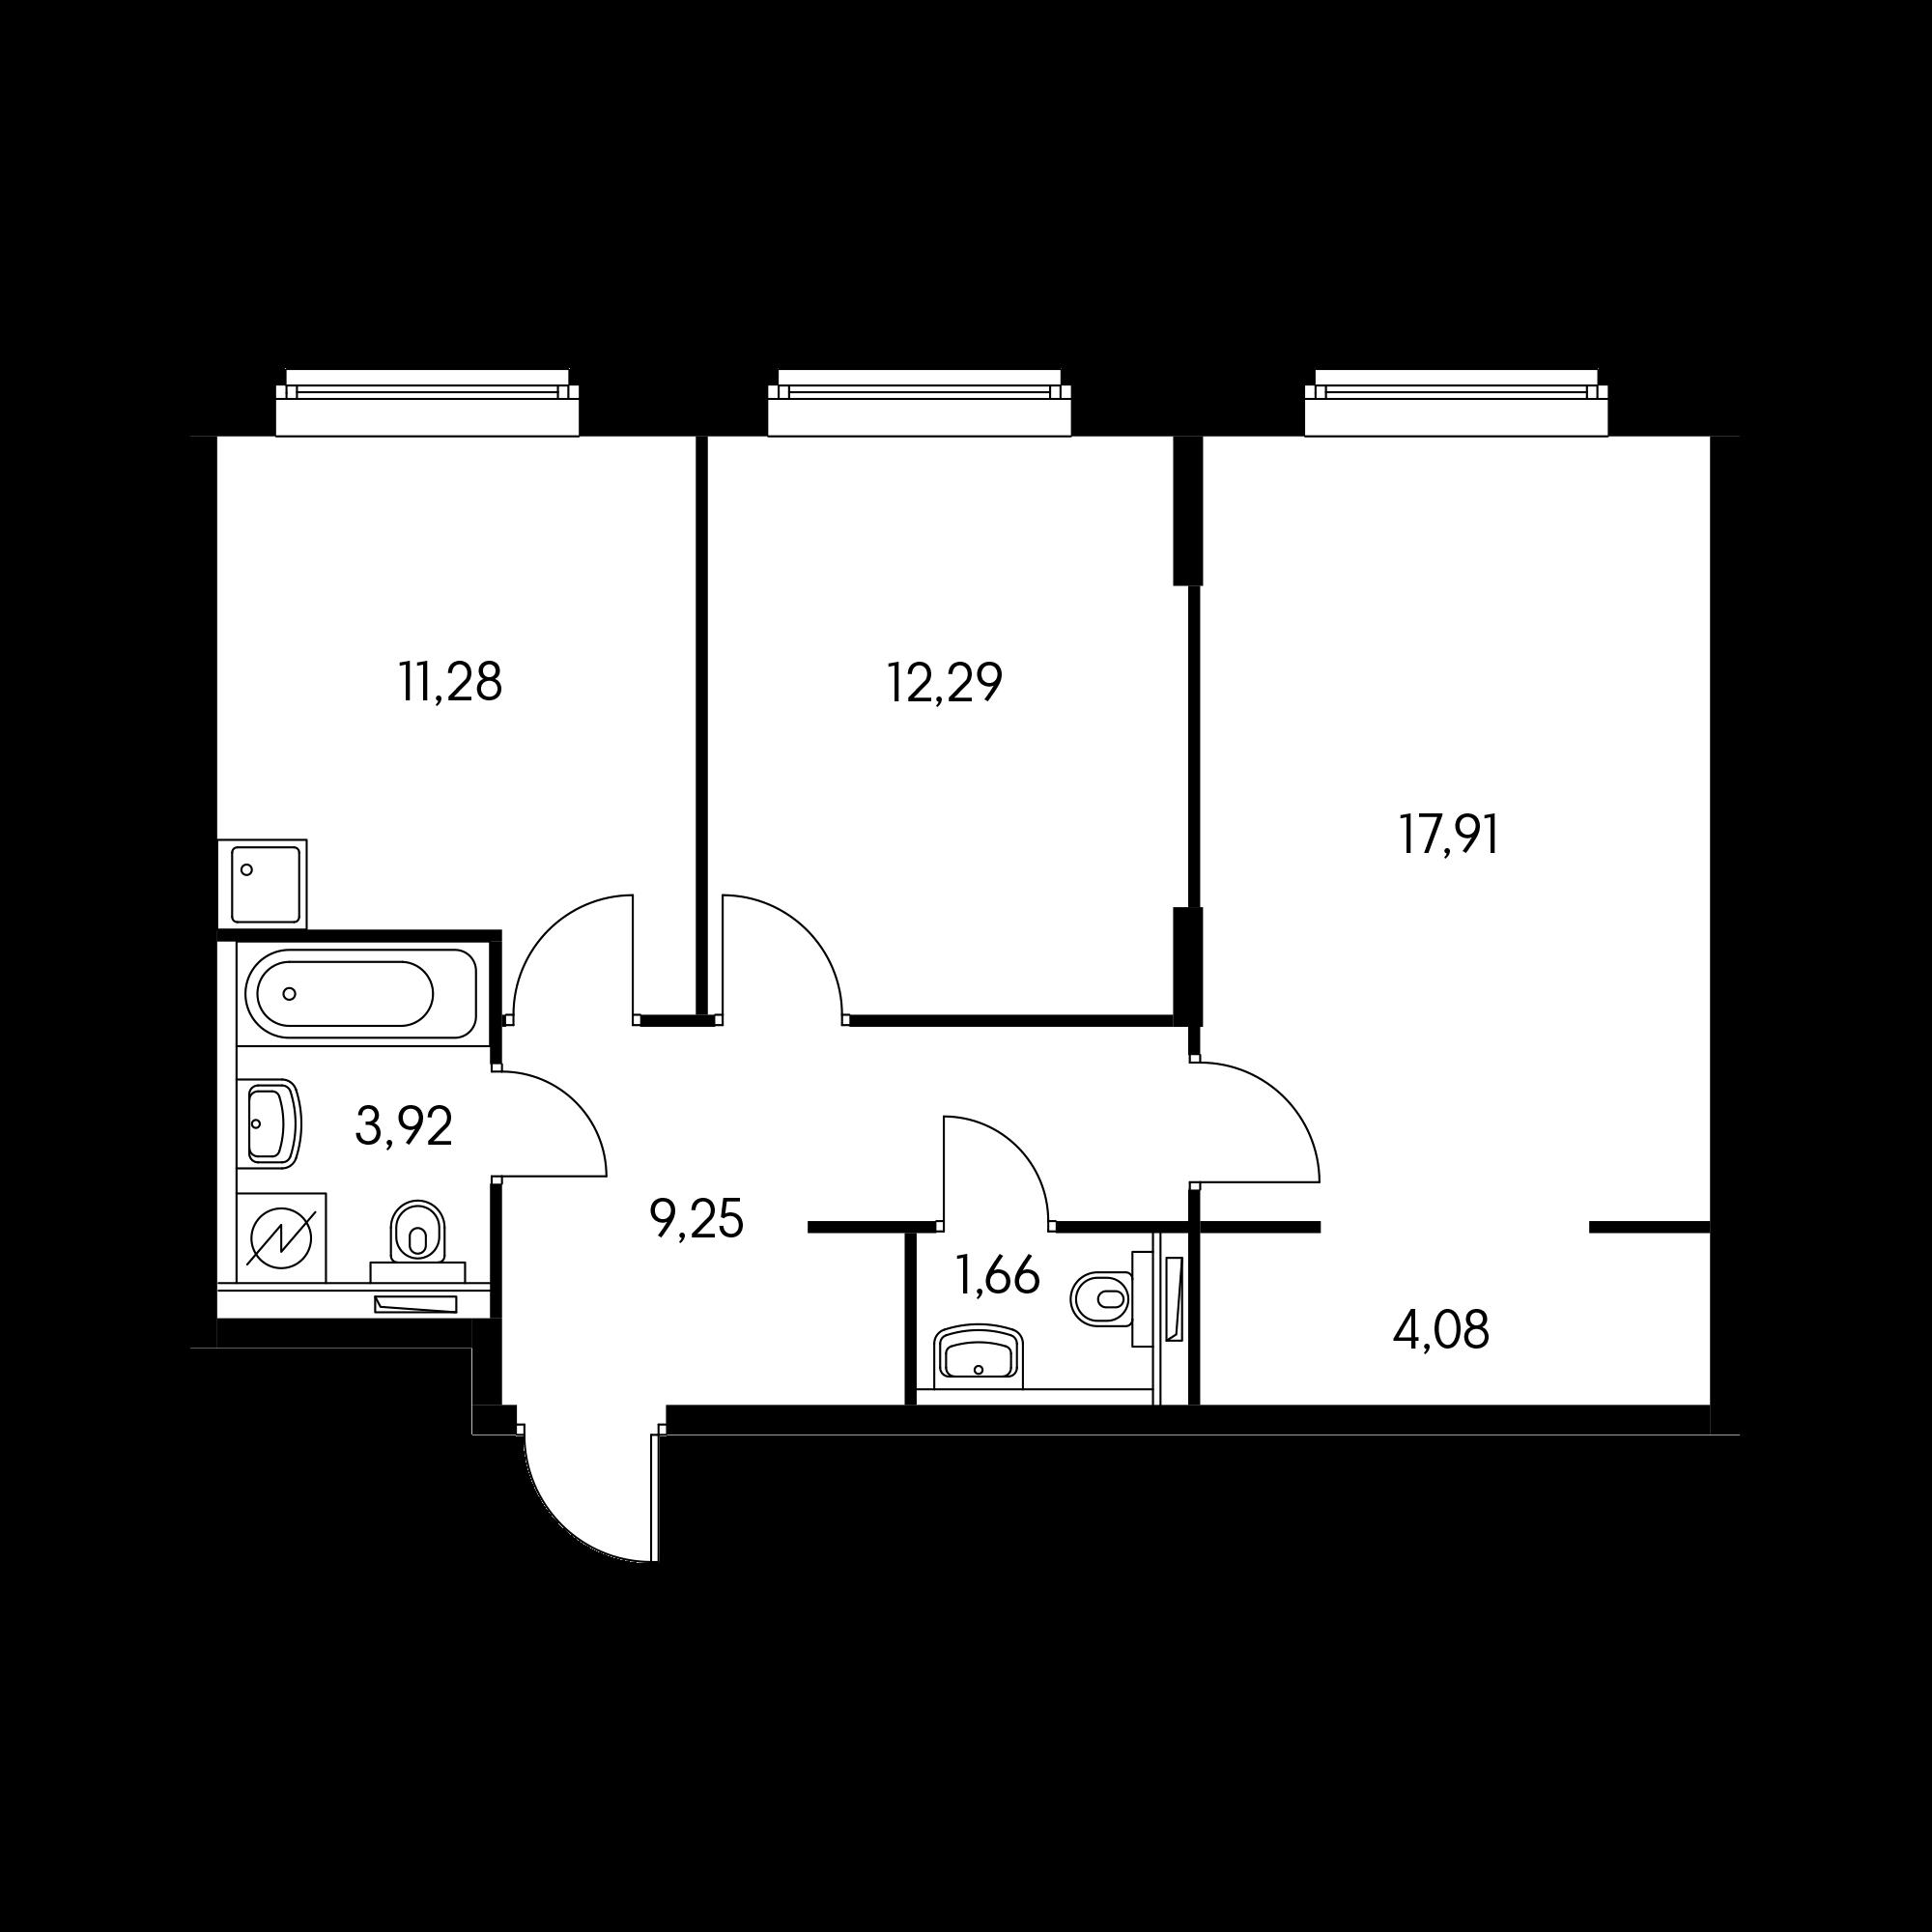 2KM6_10.2-1_A